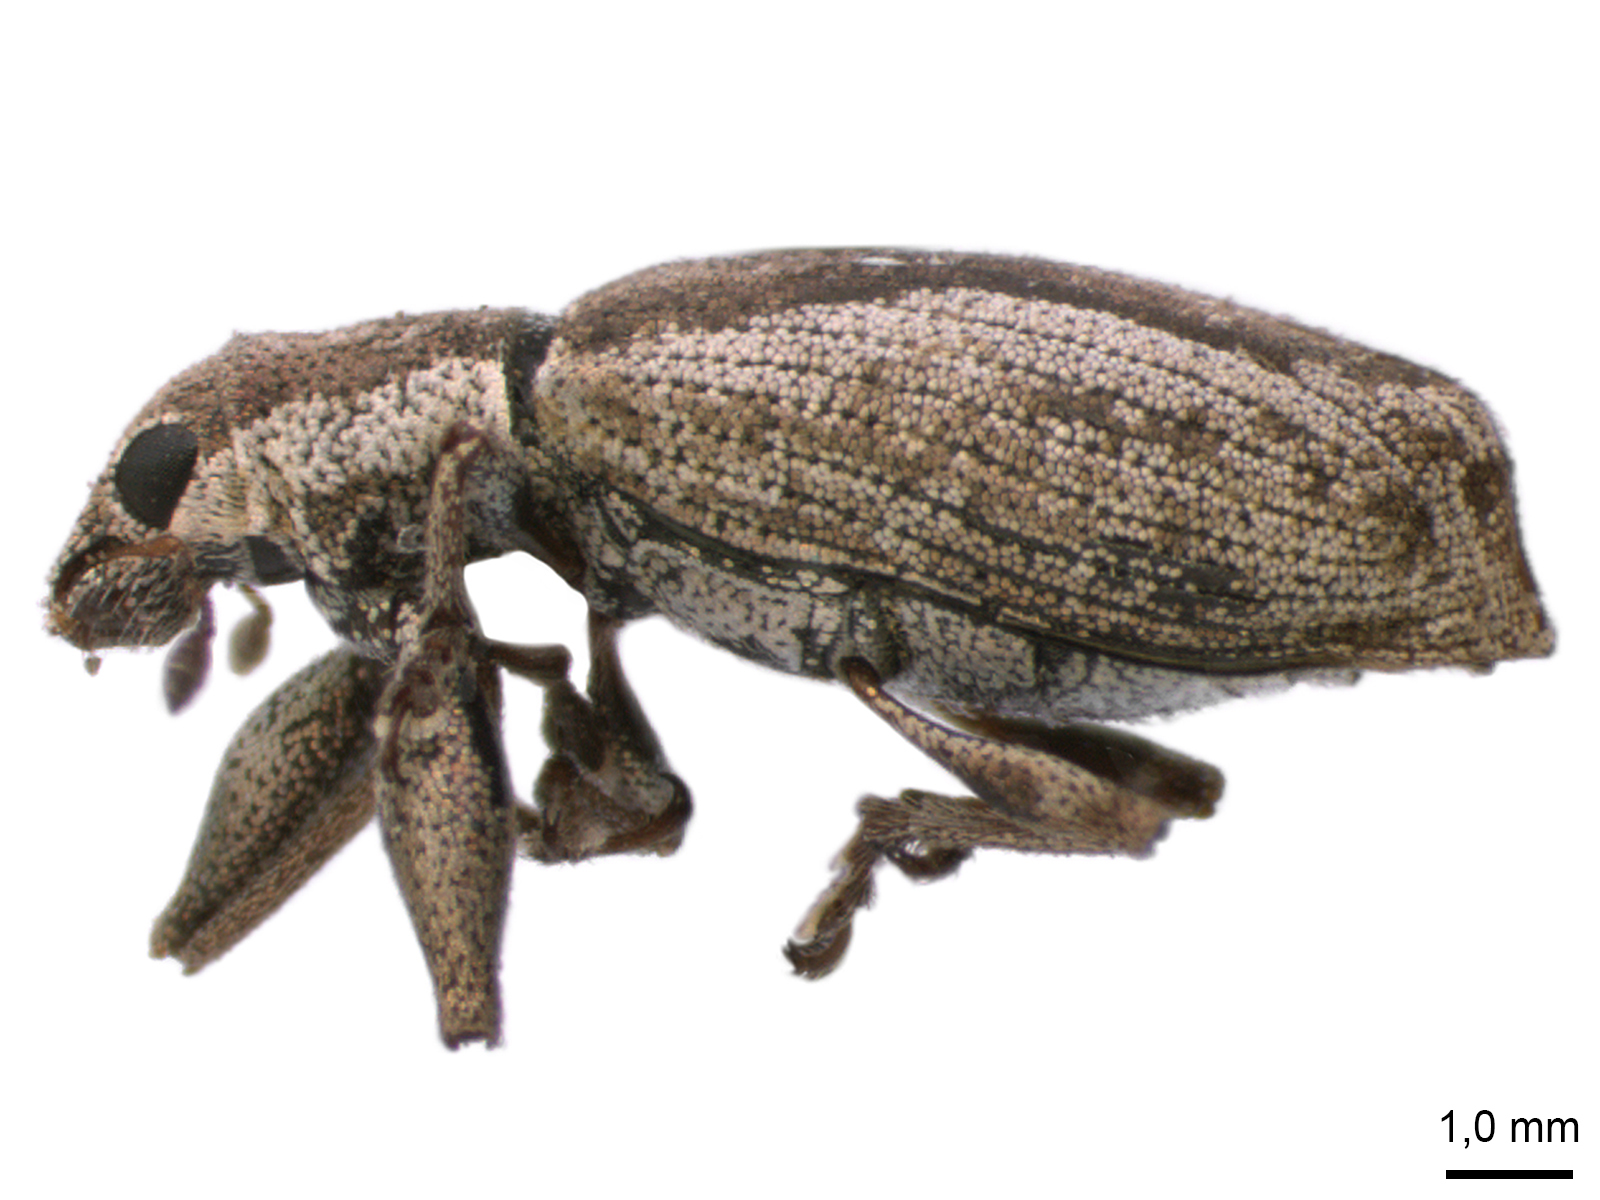 Pandeleteius spp.